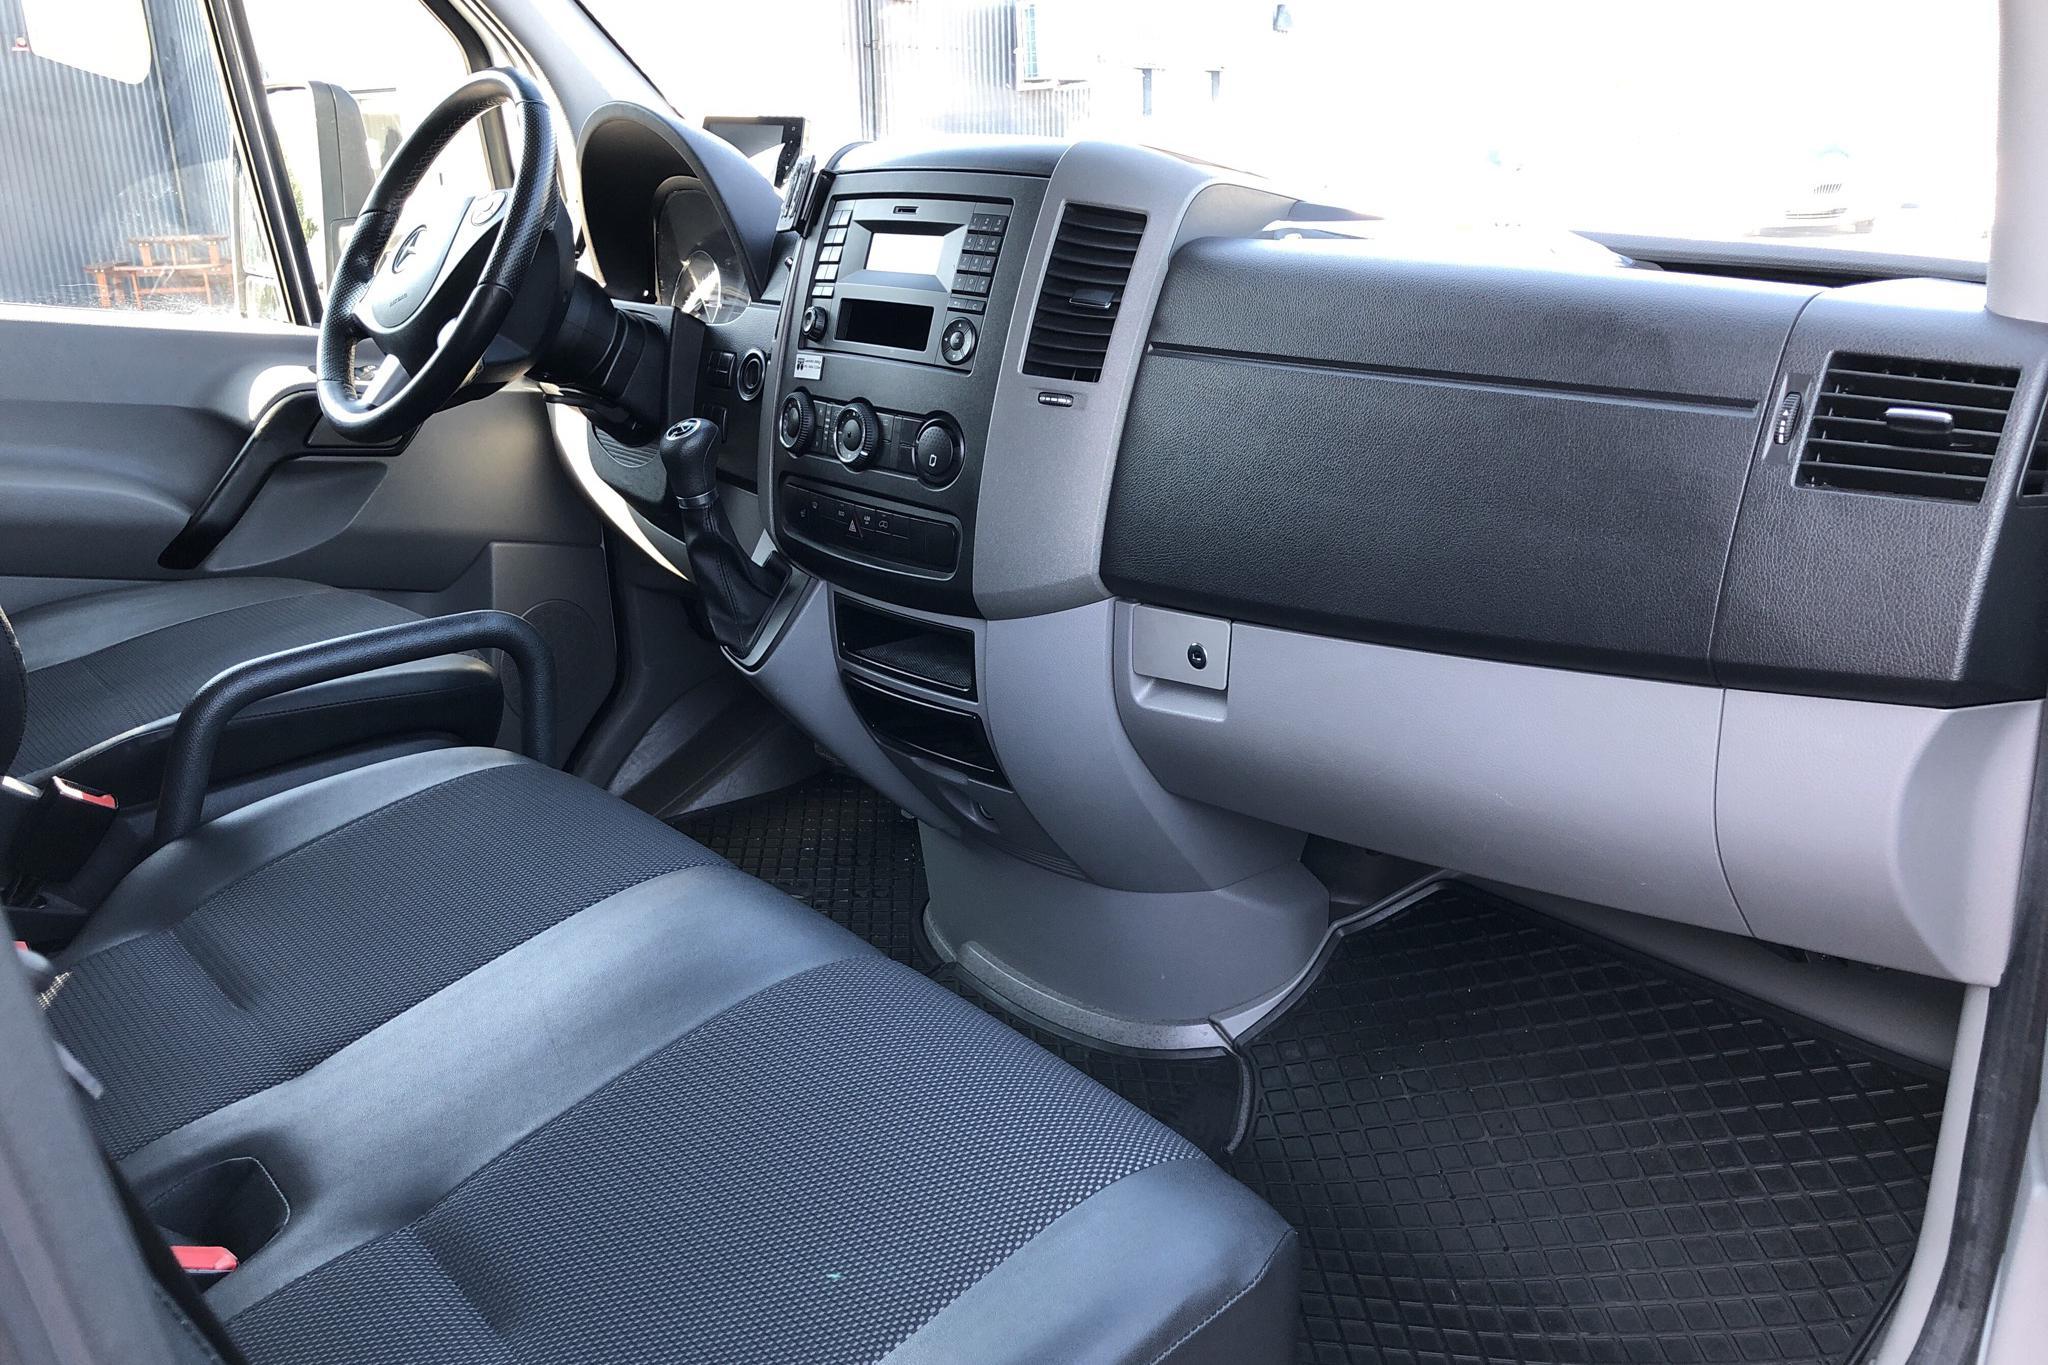 Mercedes Sprinter 316 CDI Pickup/Chassi (163hk) - 20 946 mil - Automat - vit - 2017